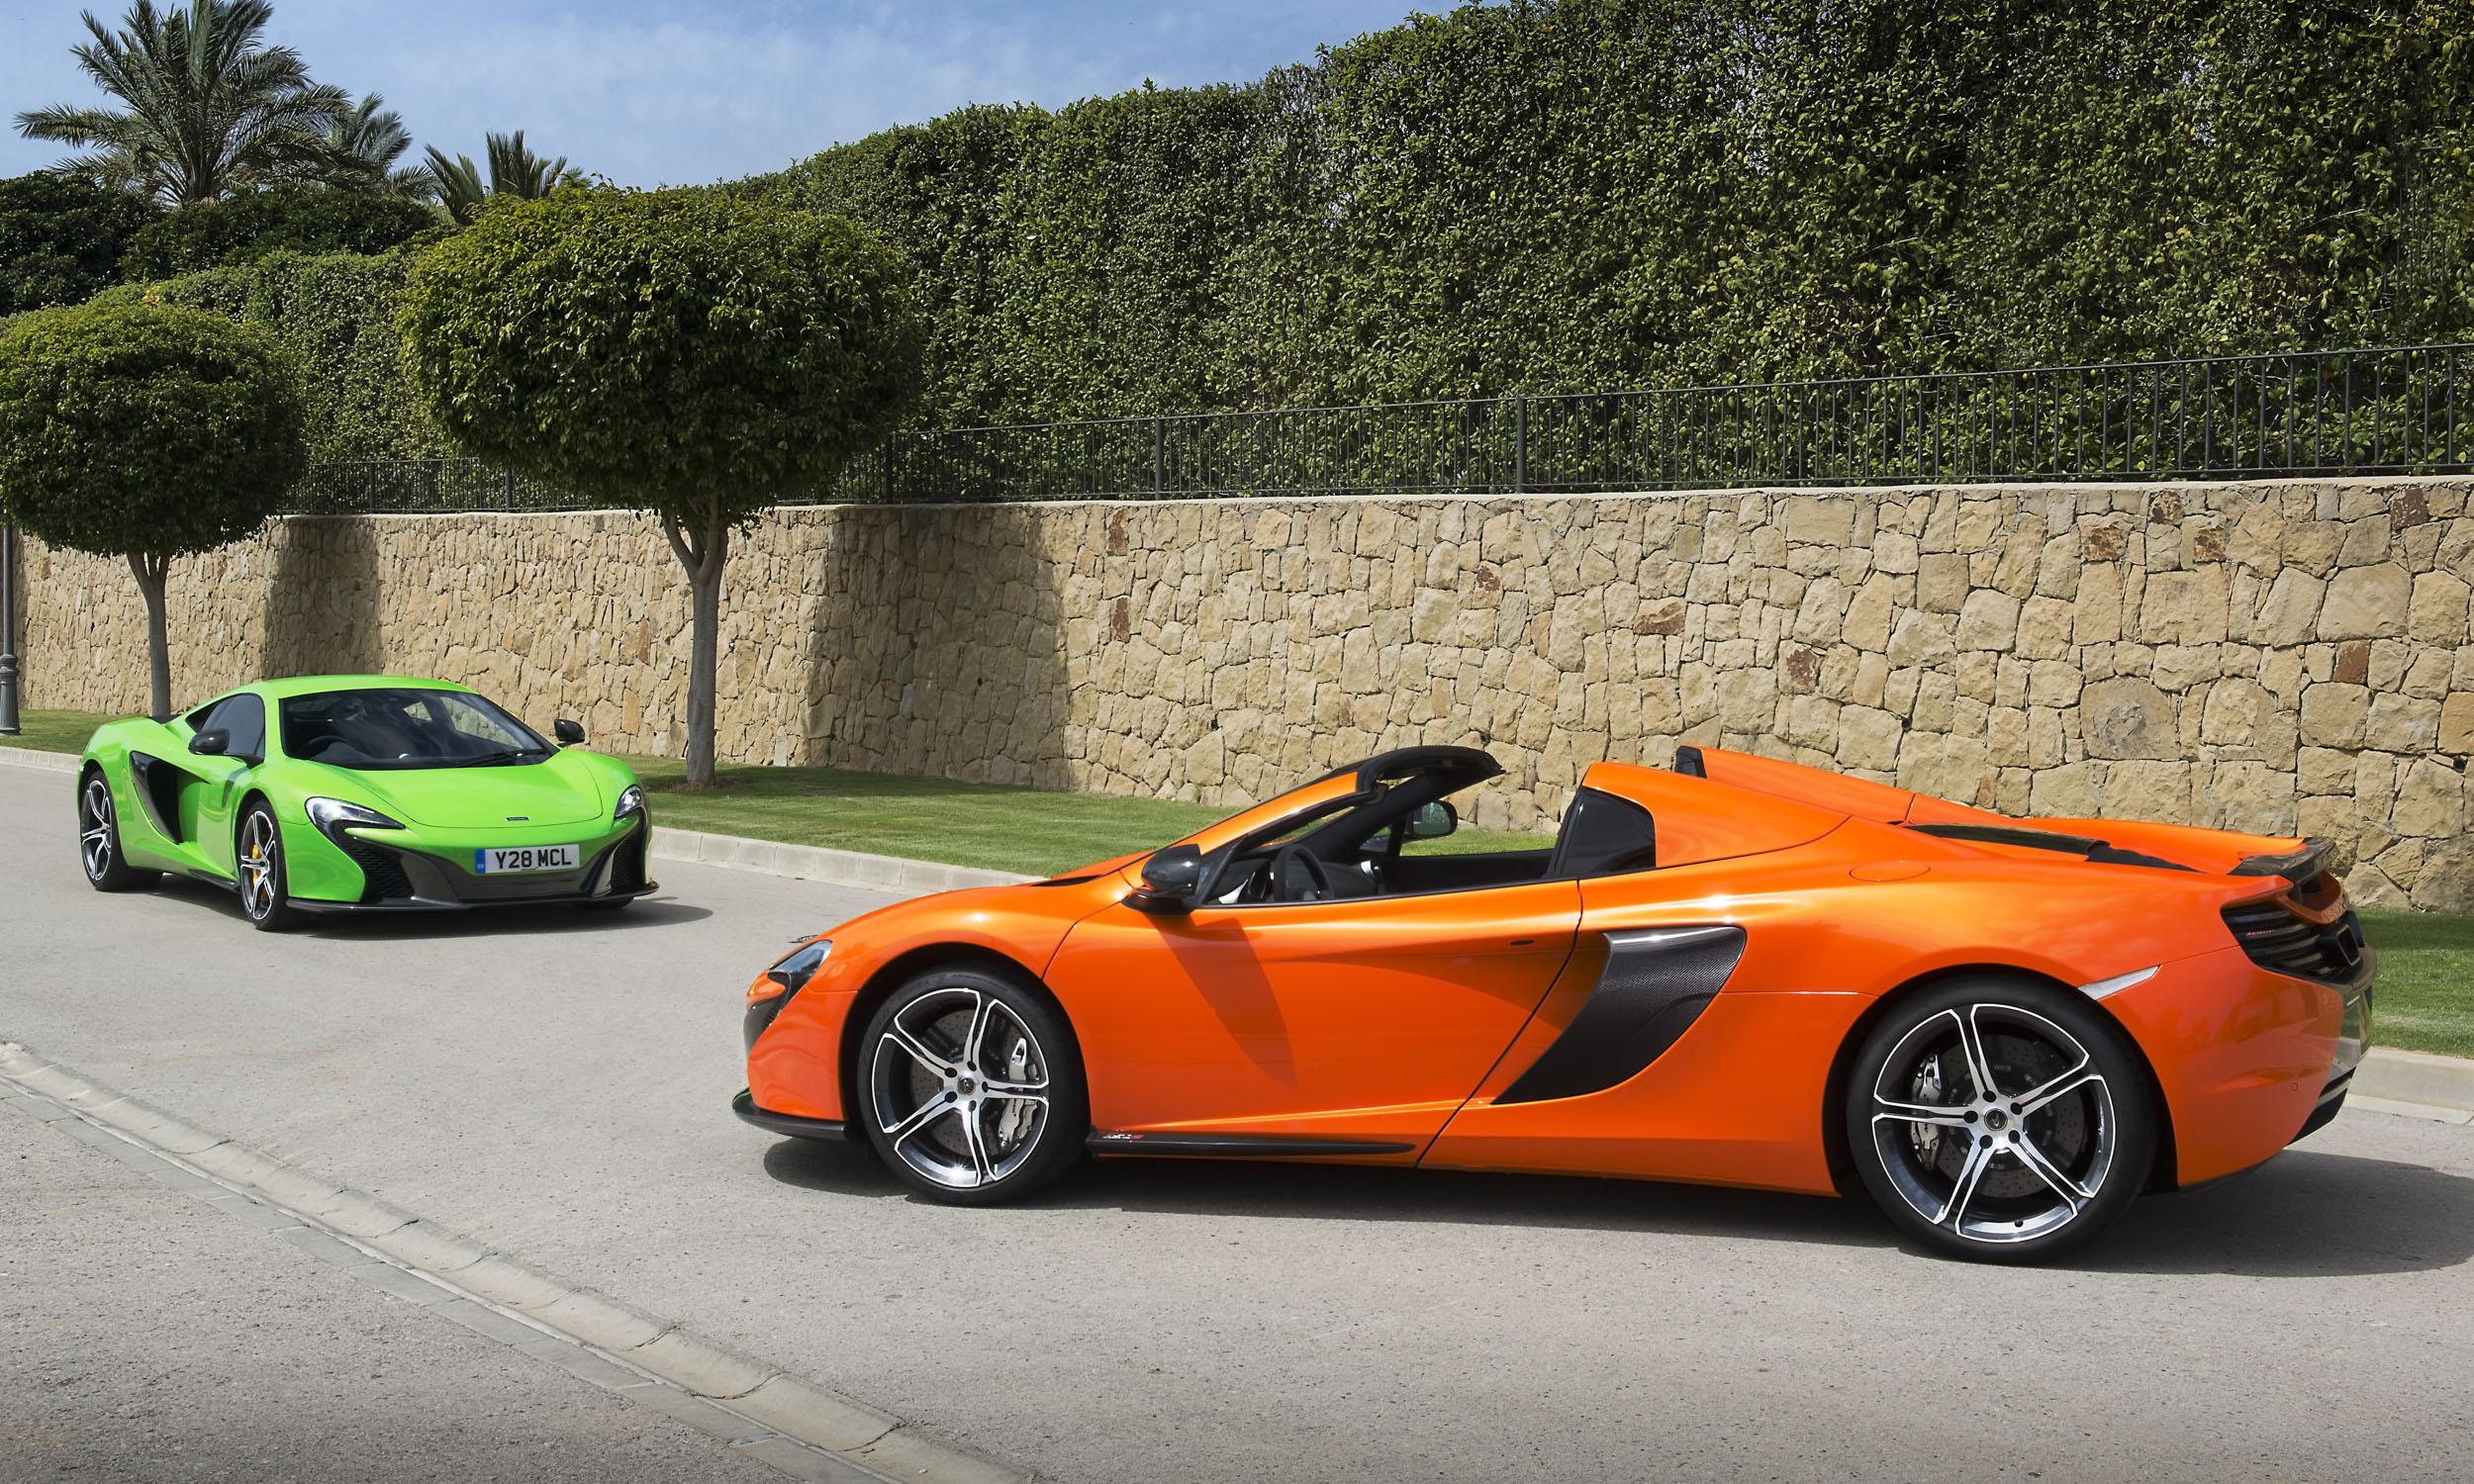 © McLaren Automotive